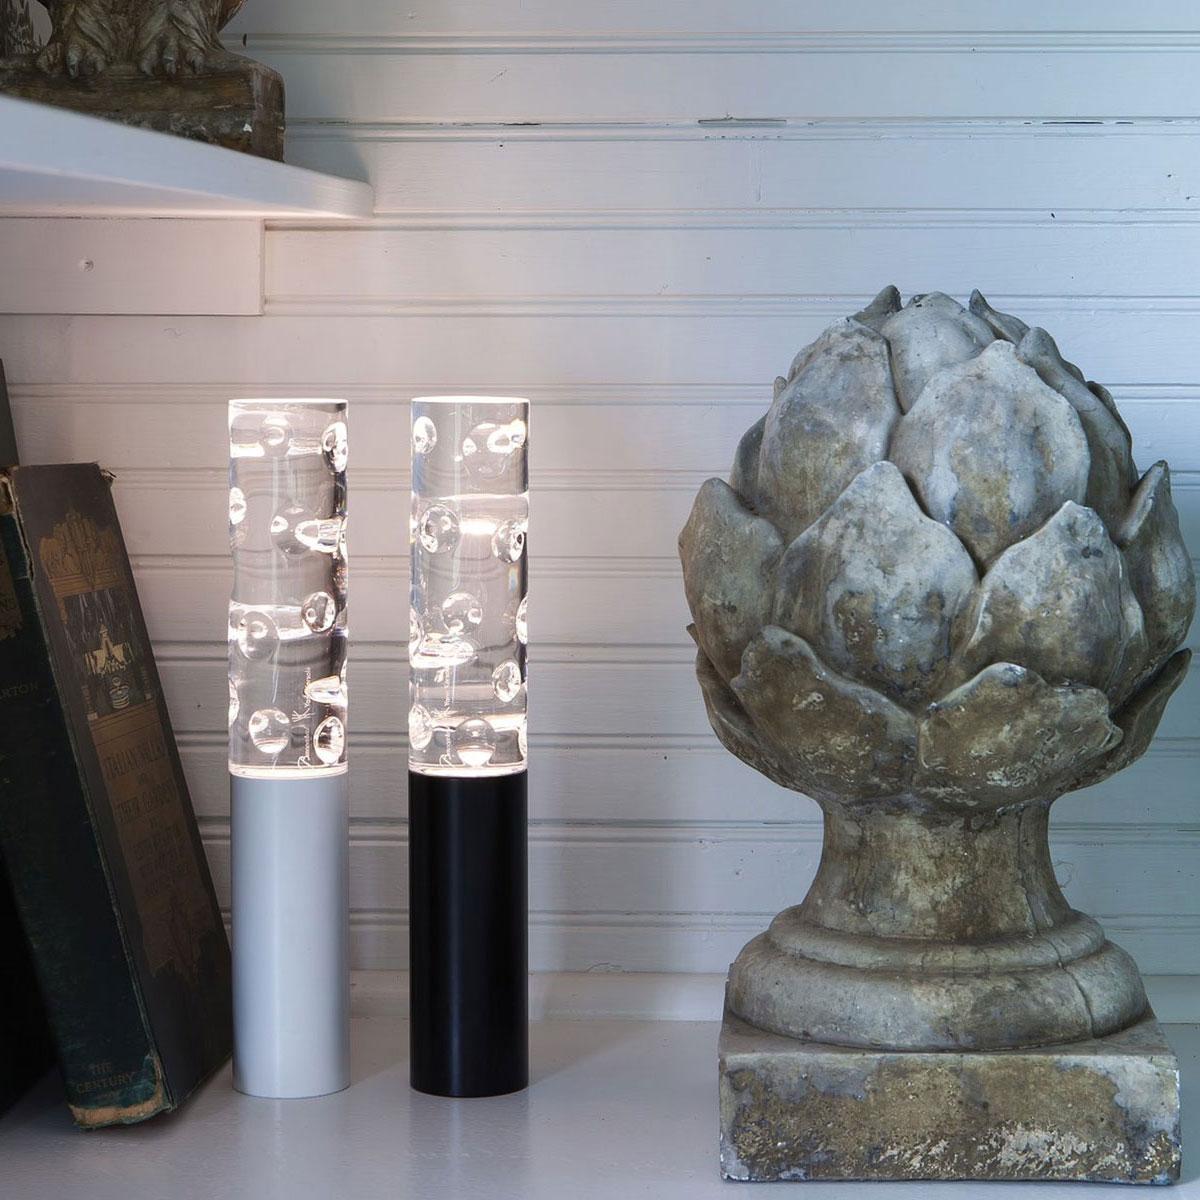 Baccarat Crystal, Jallum Pontil Candle Lamp, 1 Lamp, White